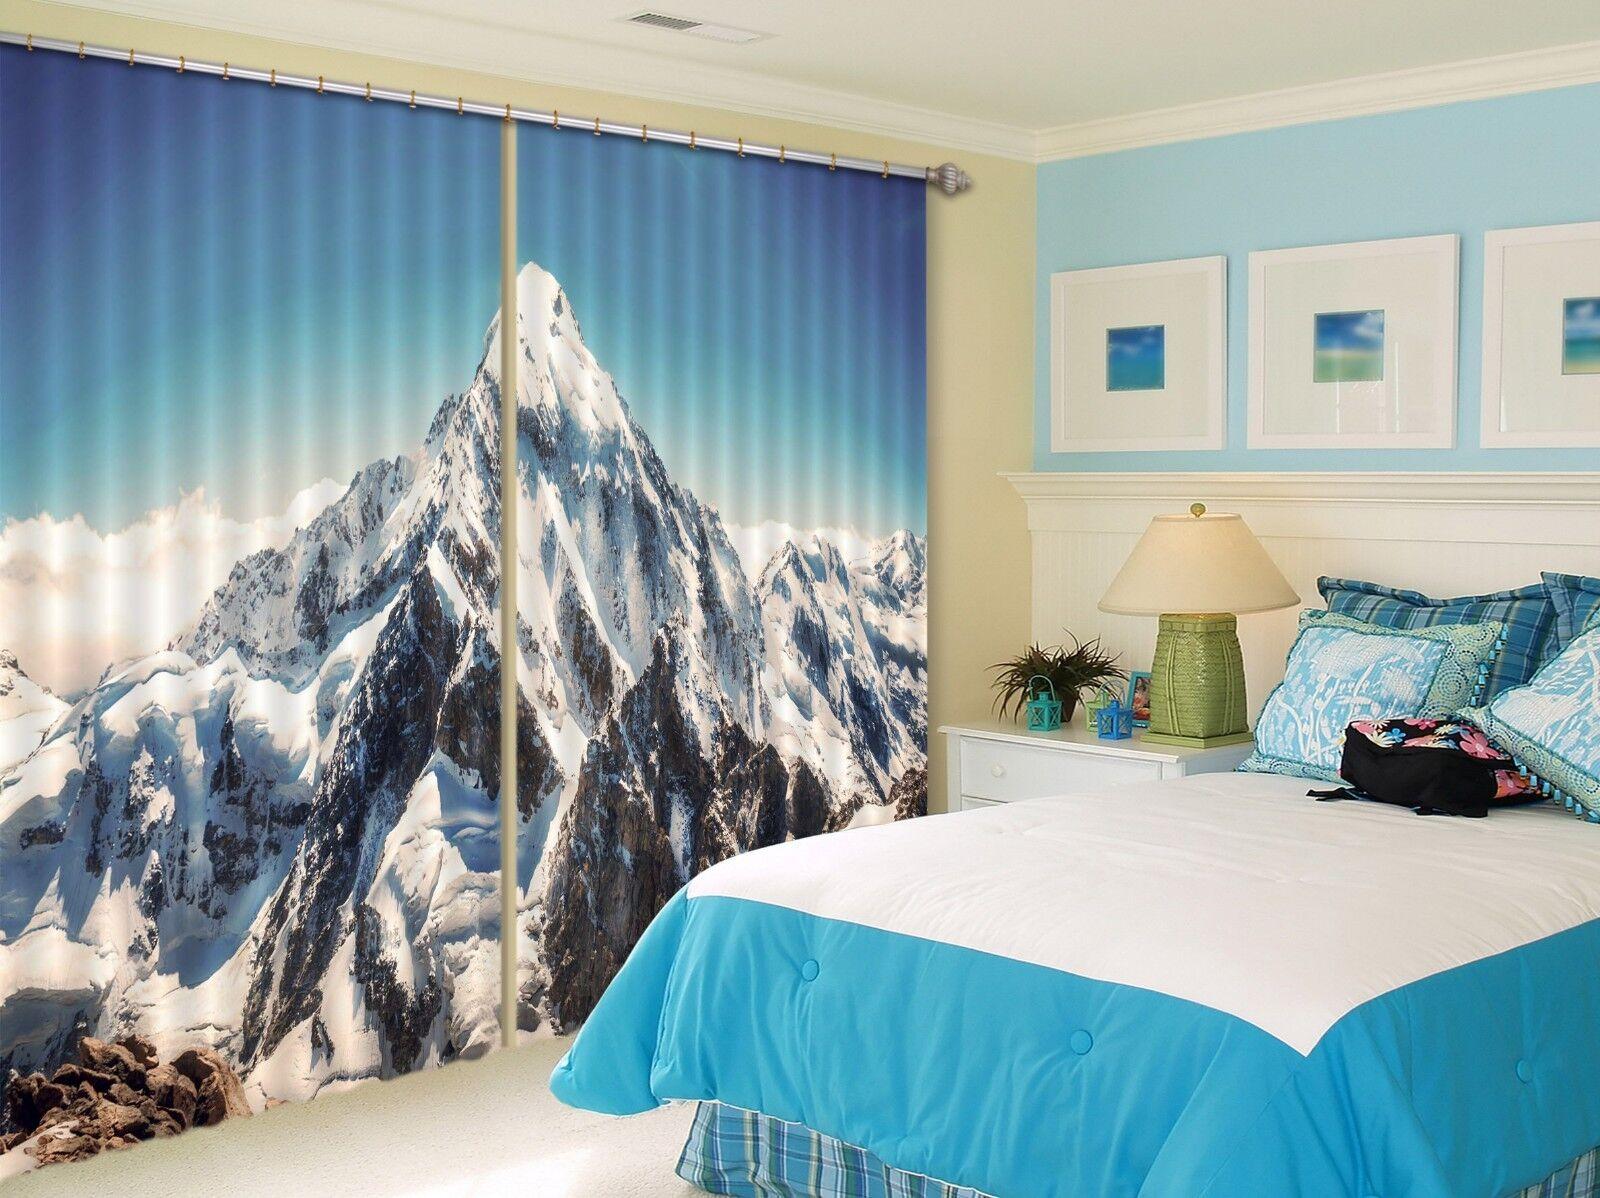 Foto 3D colinas de nieve 9 Blockout Cortina Cortinas De Impresión Tela Cortinas Ventana CA